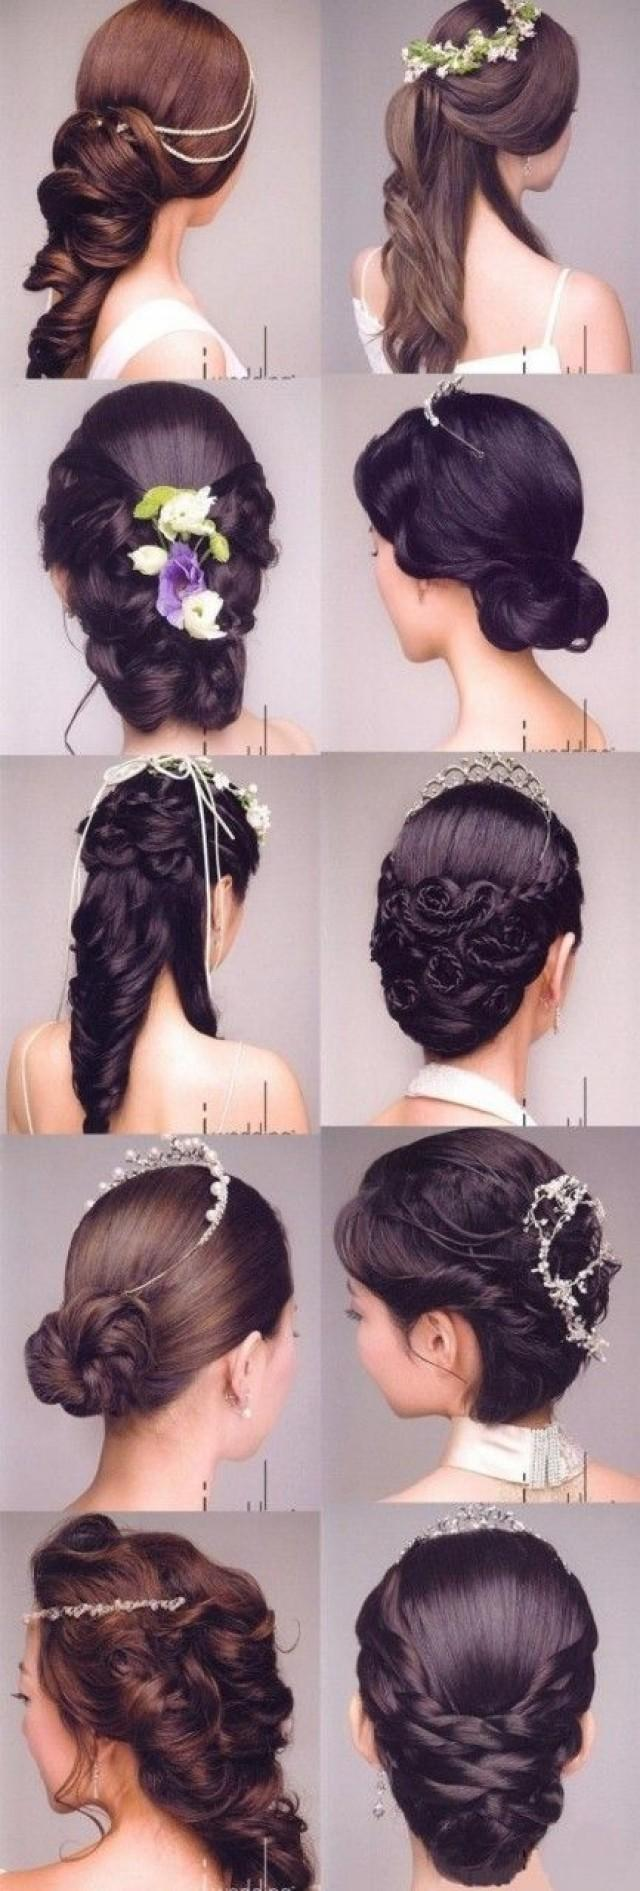 Hair Art Ref 2267498 Weddbook